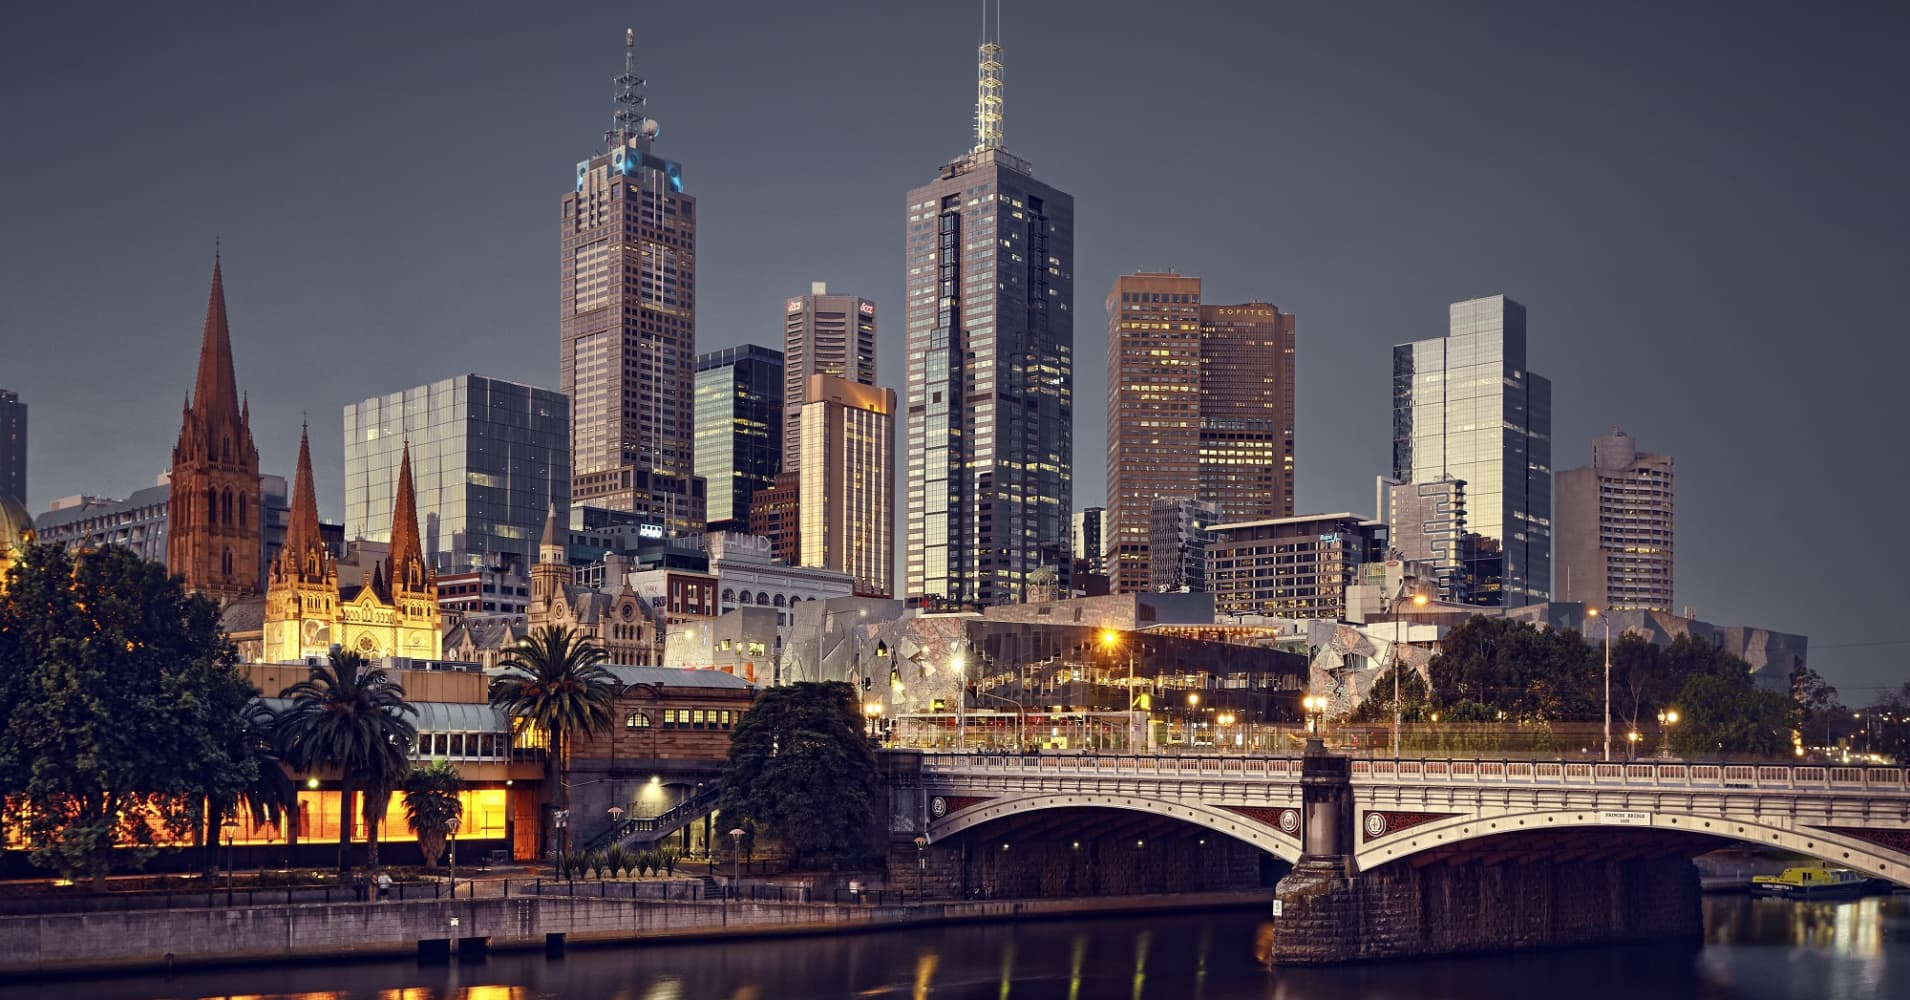 Melbourne, Australia, at night.